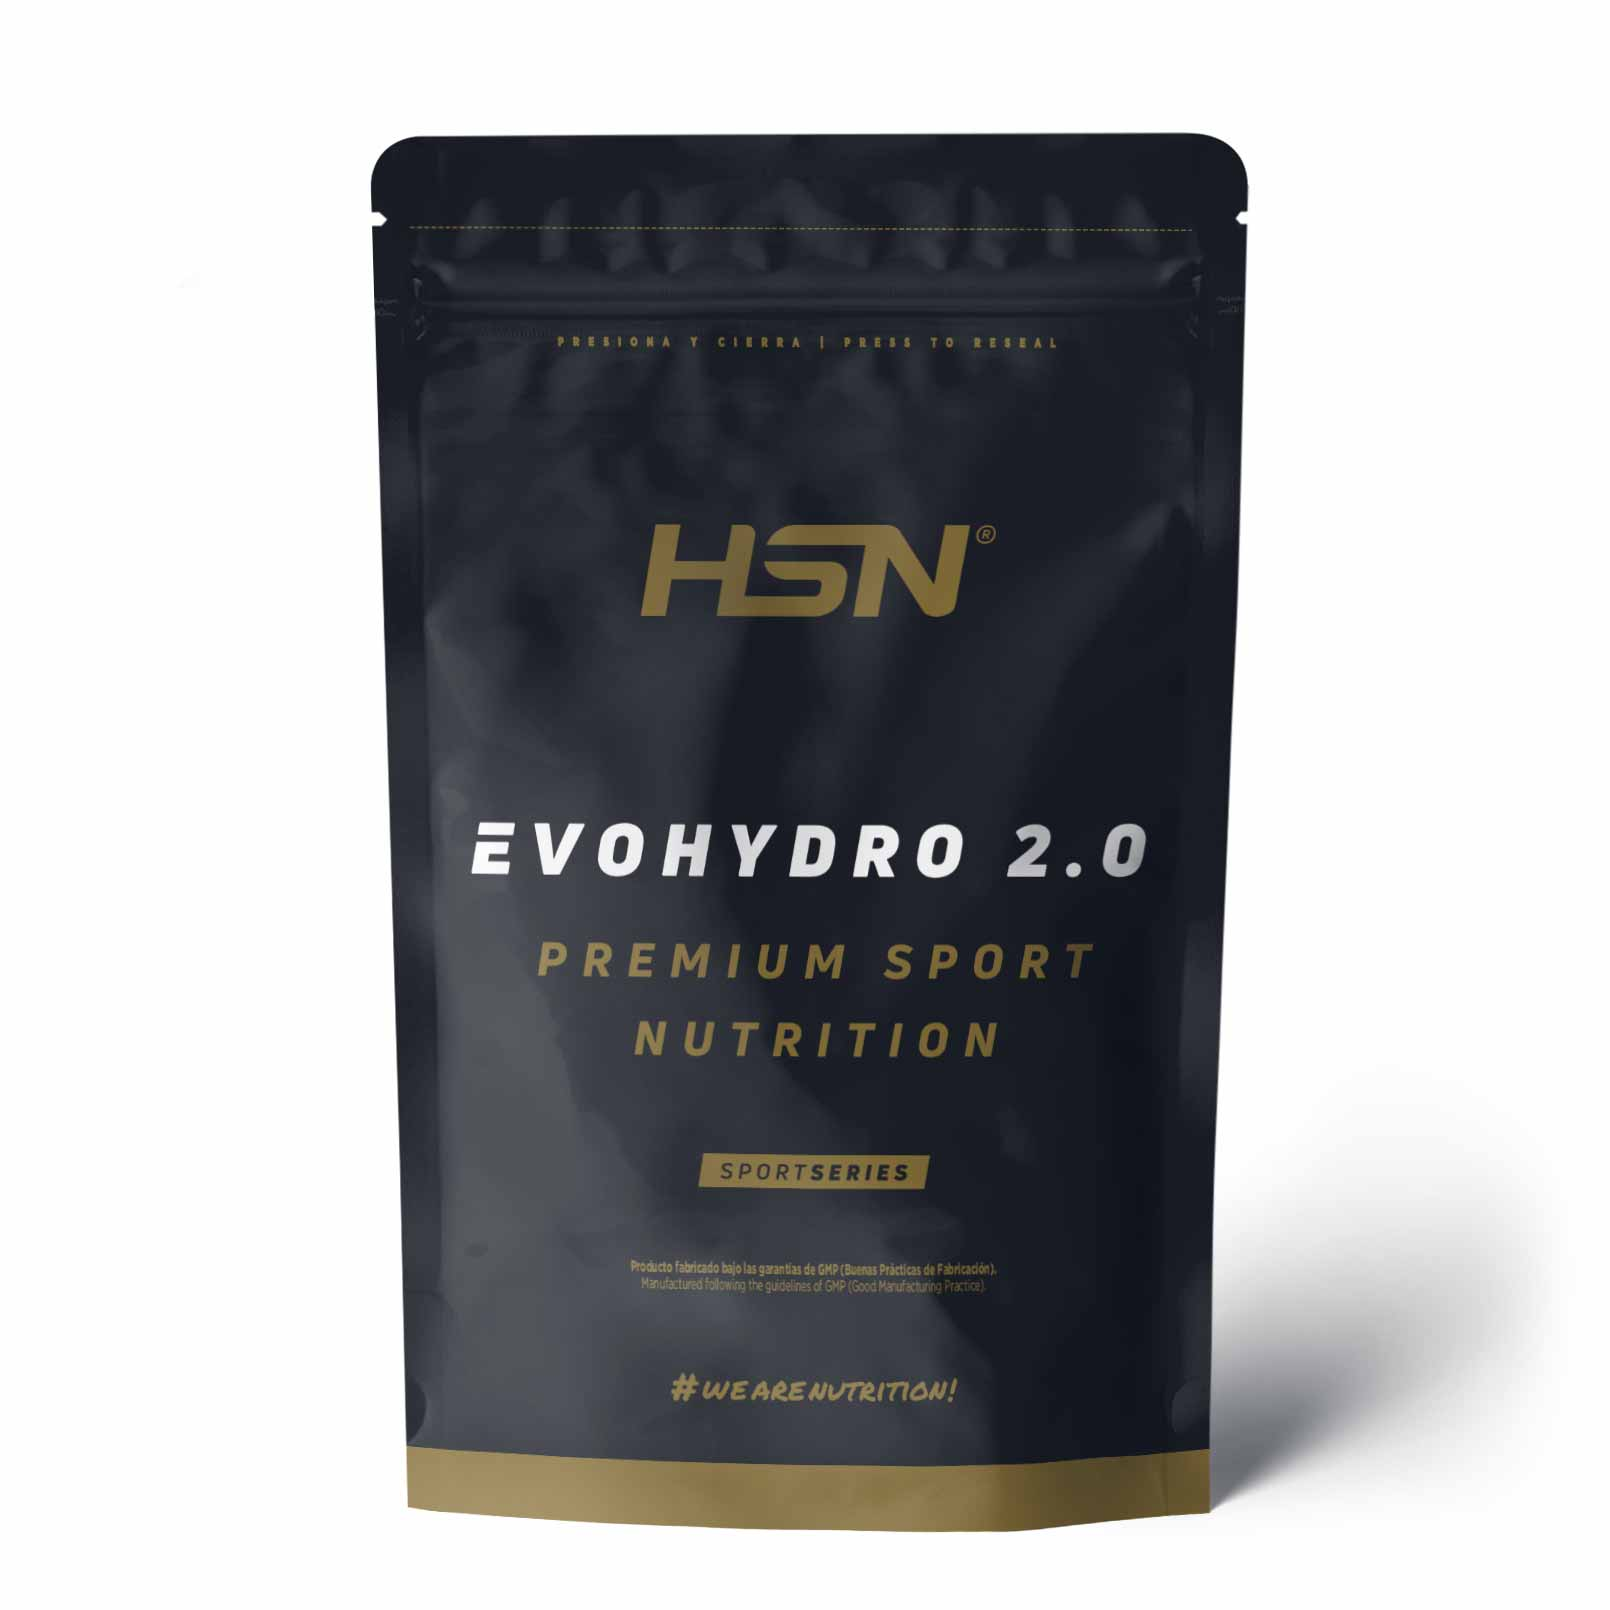 Evohydro (Hydro Whey) 2.0